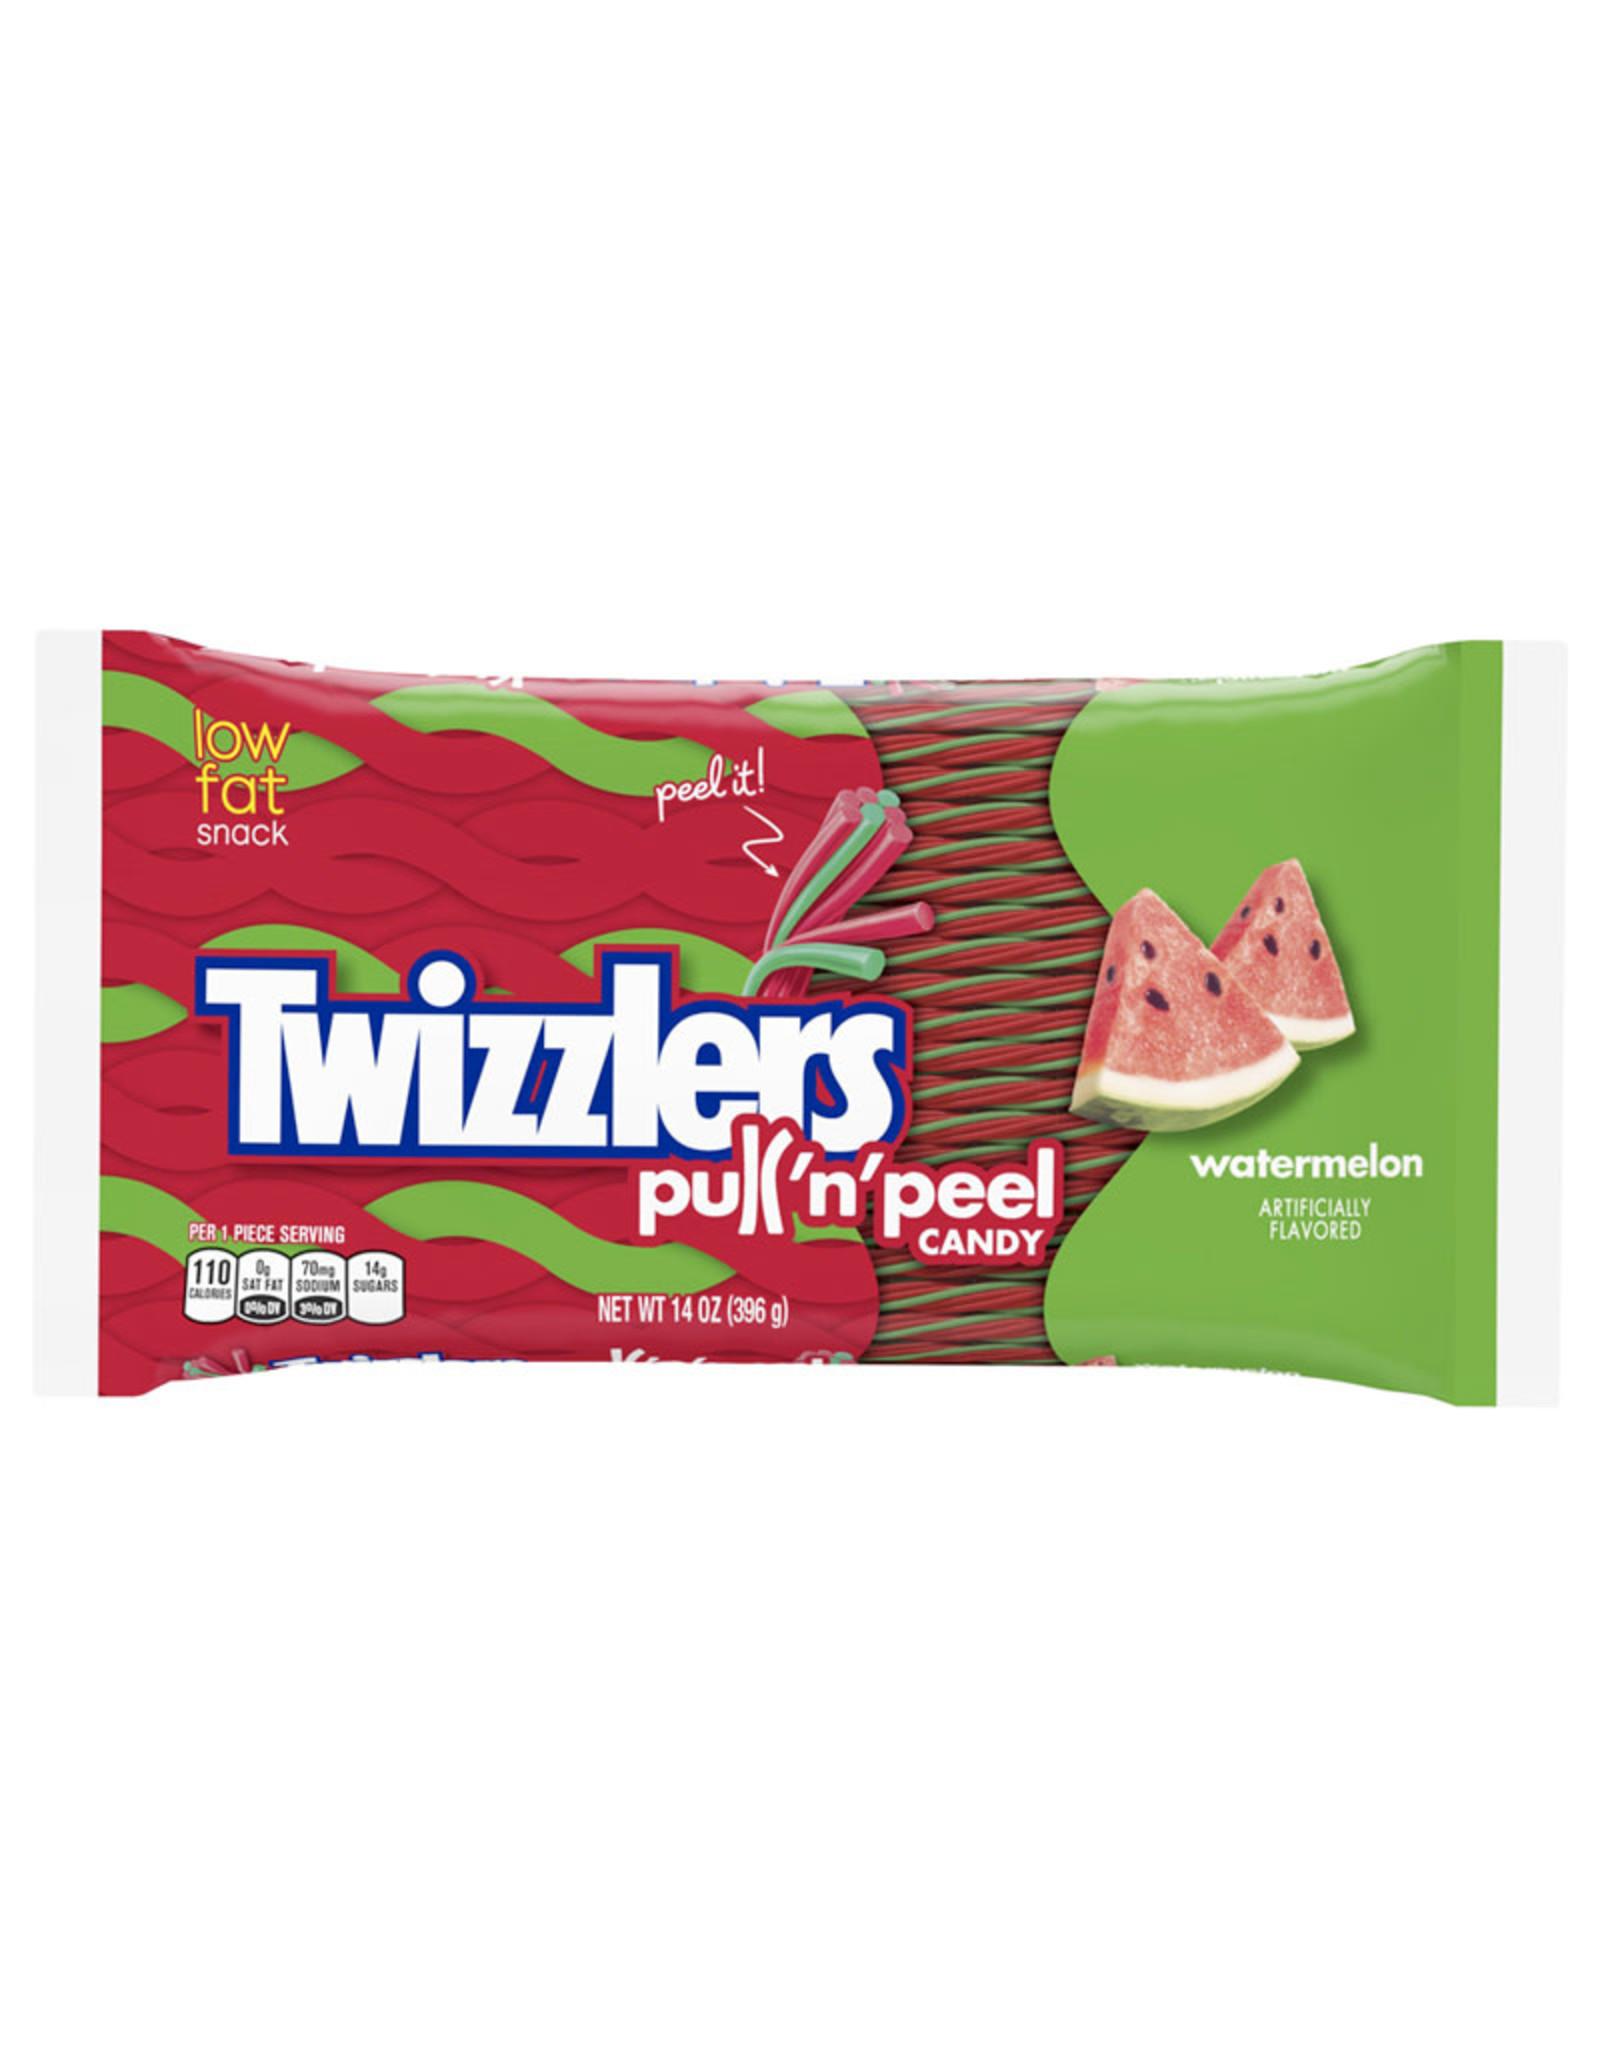 Twizzlers Pull 'n' Peel - Watermelon - LARGE - 396g